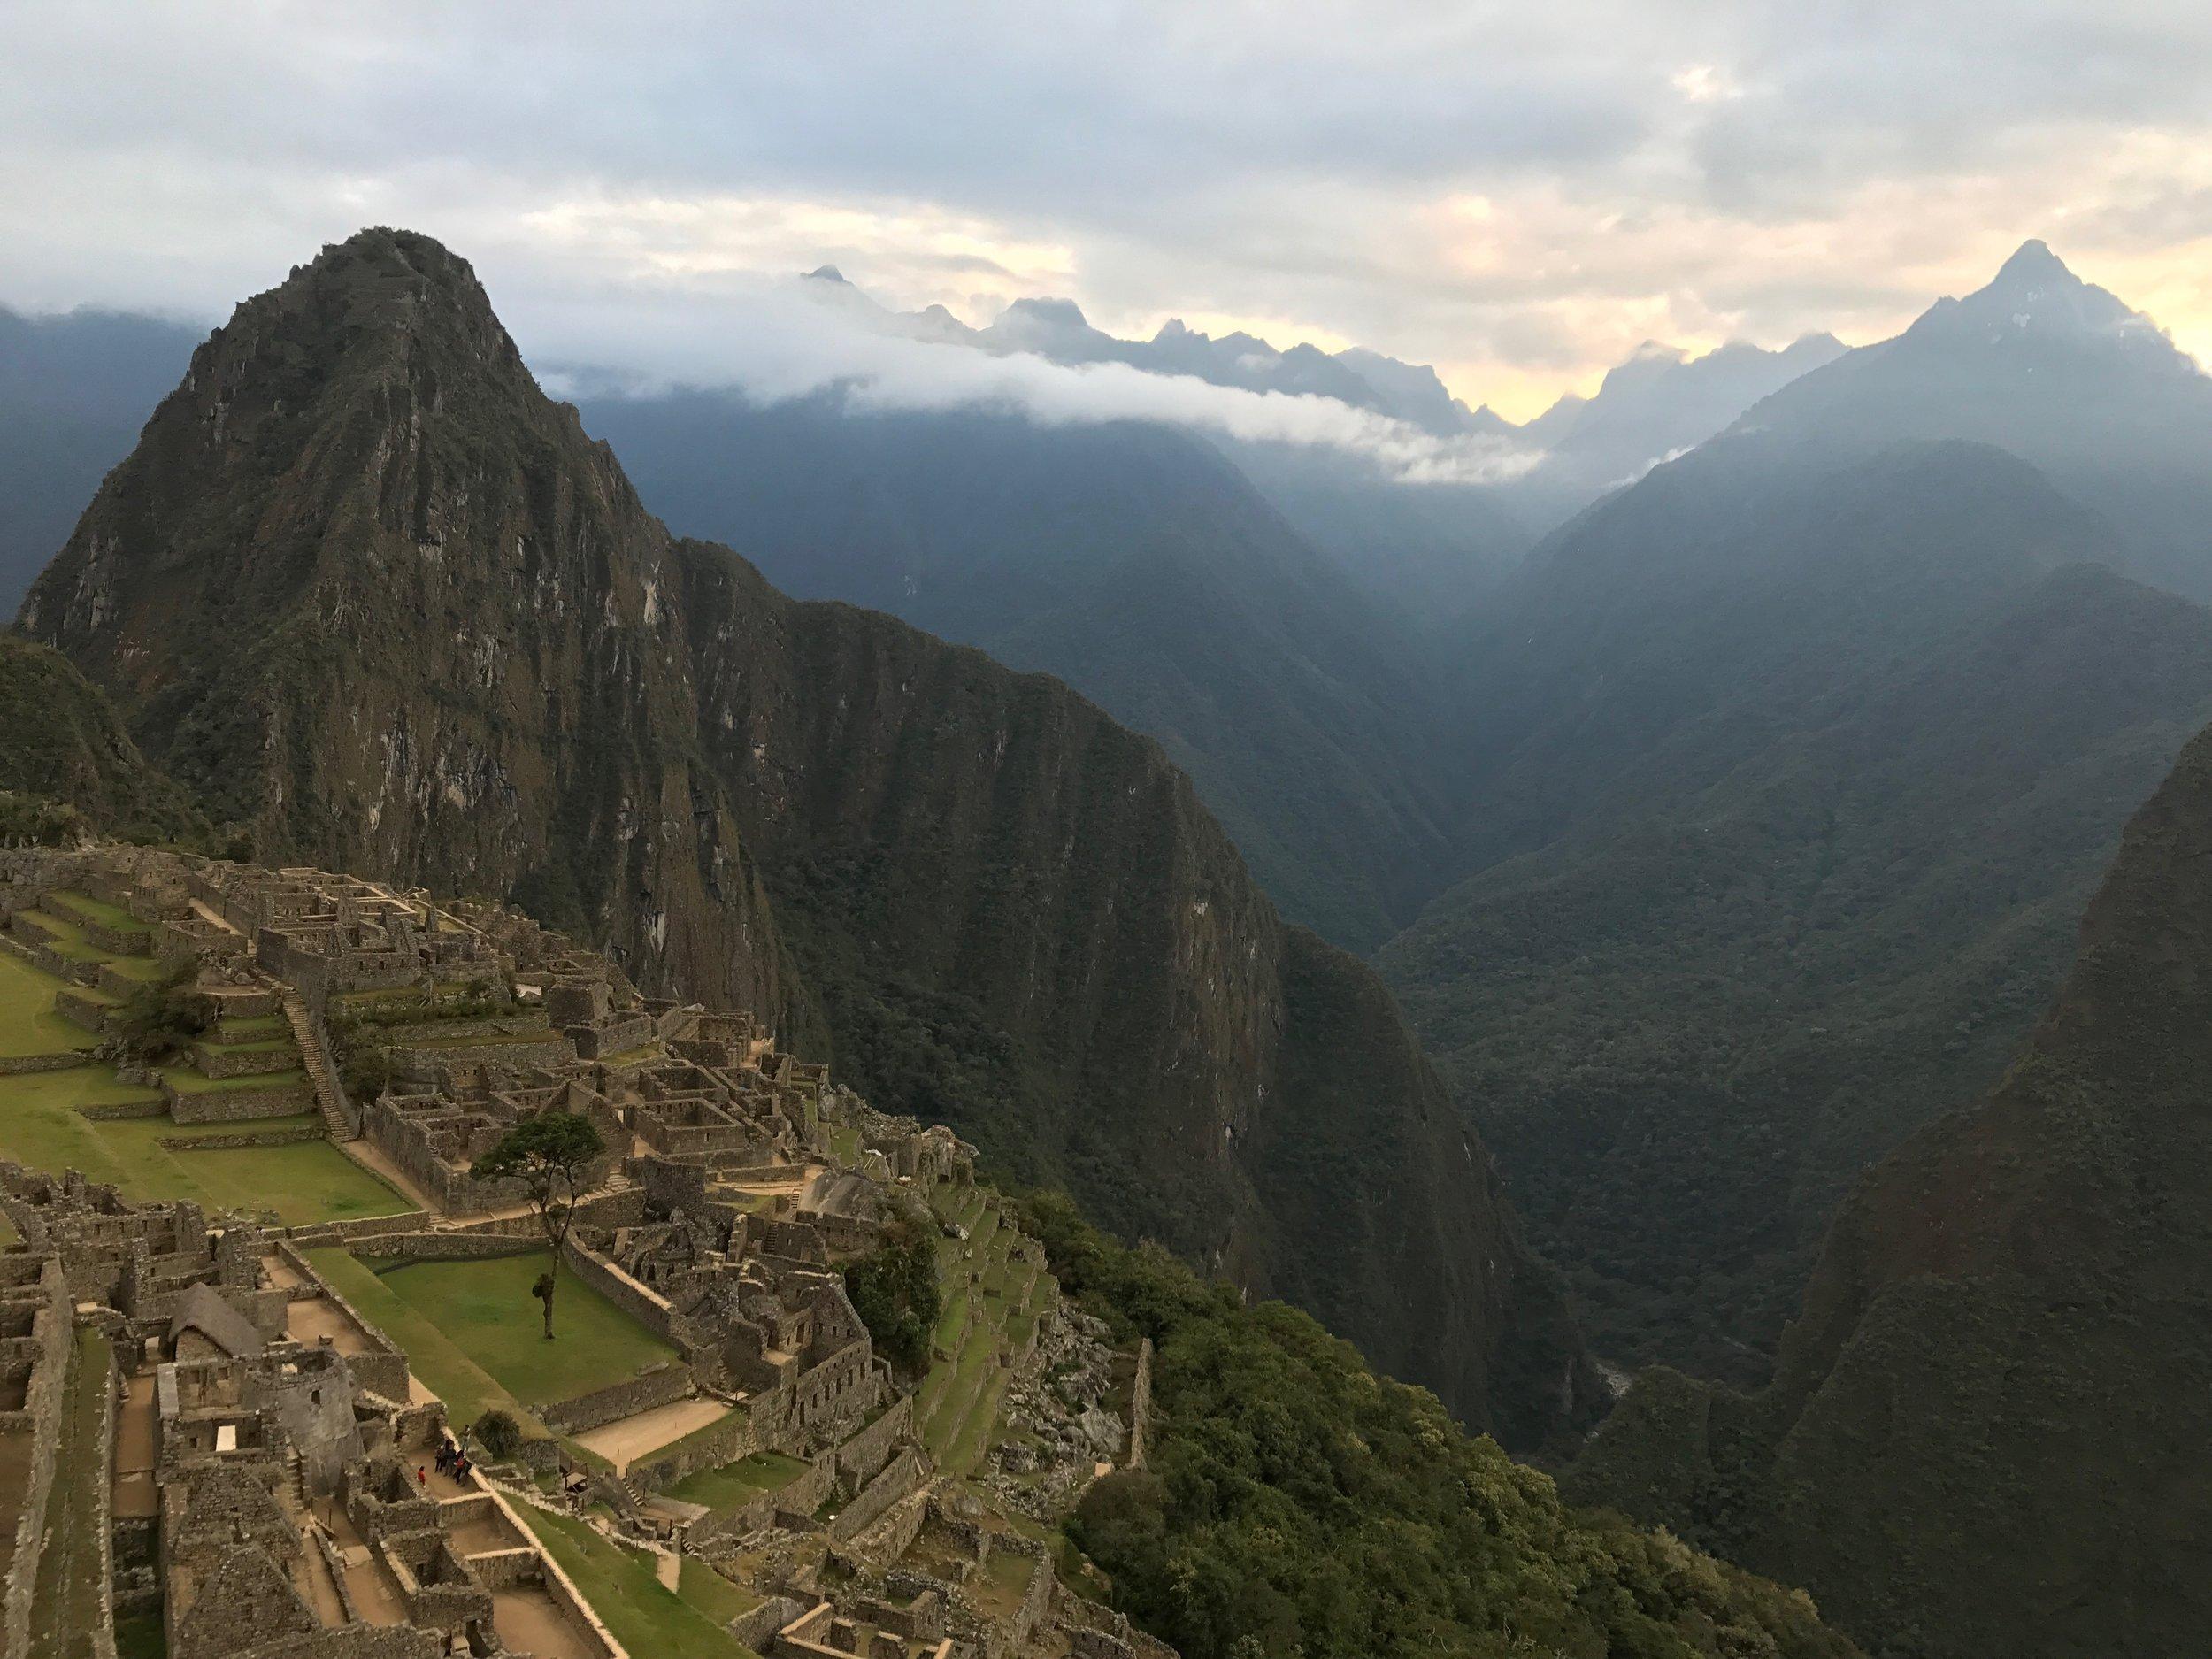 Huayna Picchu, Machu Picchu, Peru - 2017 Photo taken by Andrew Vaughn